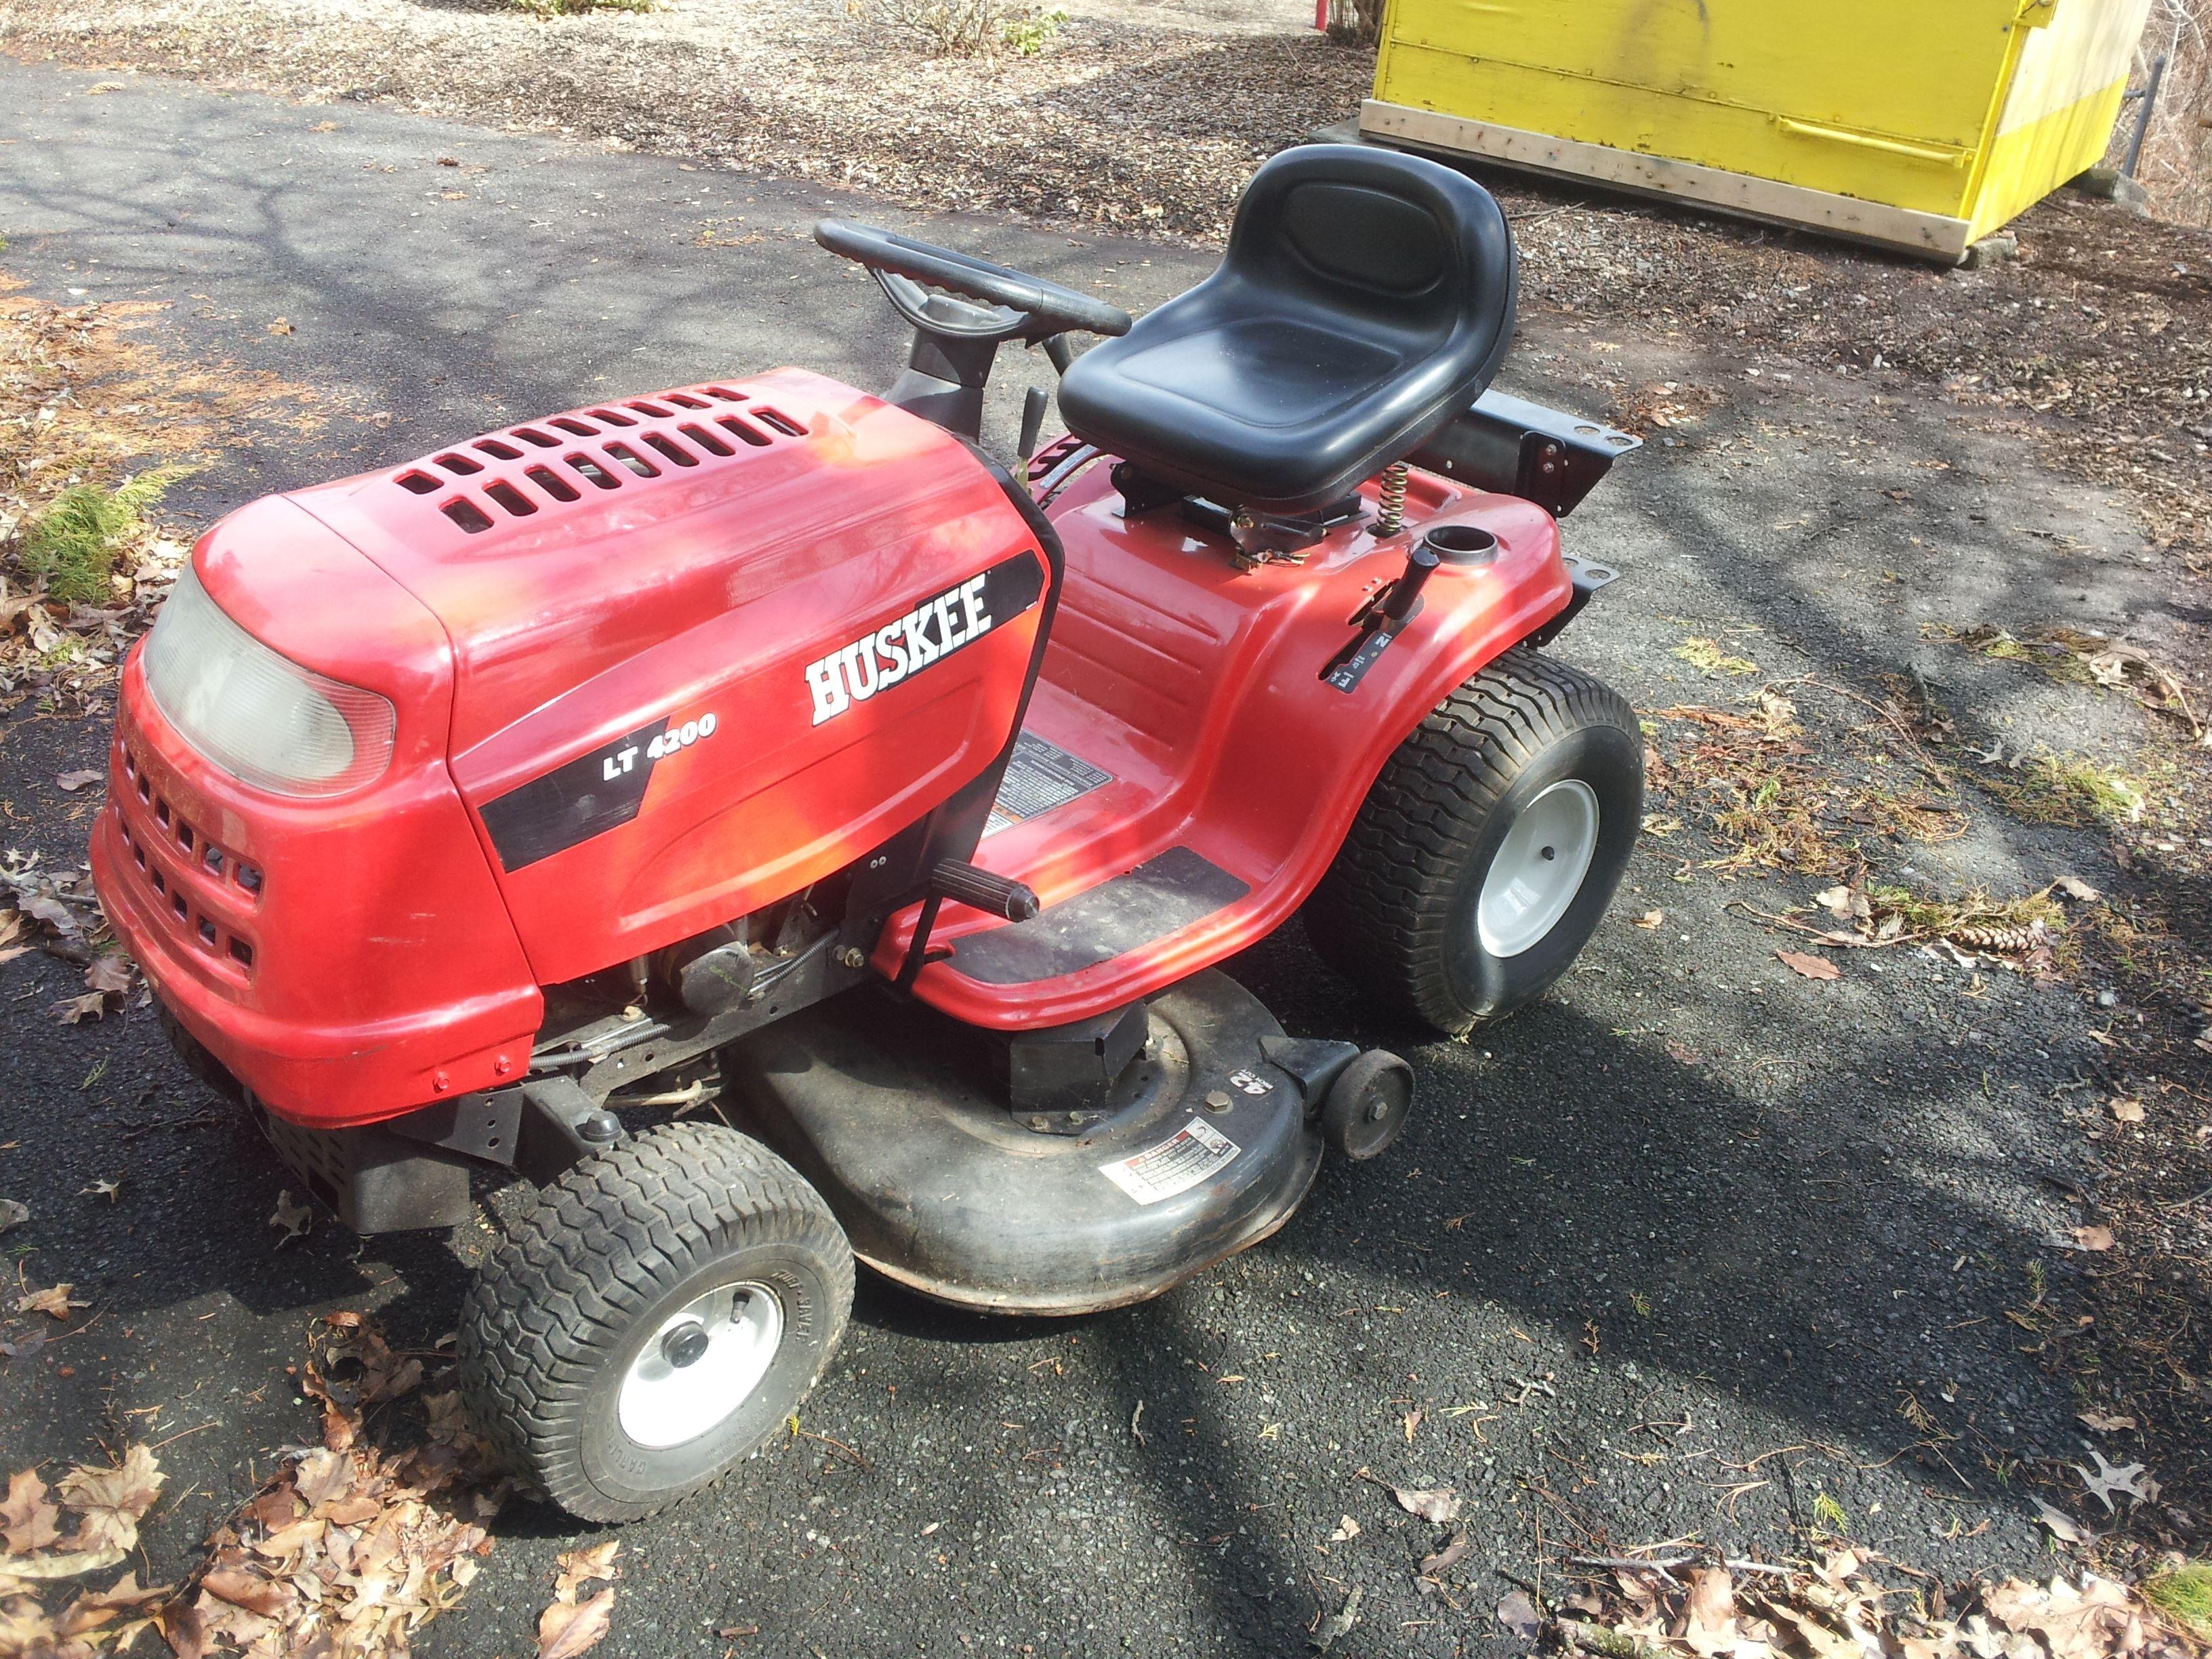 huskee lt 4200 riding mower for sale on municibid com [ 3264 x 2448 Pixel ]